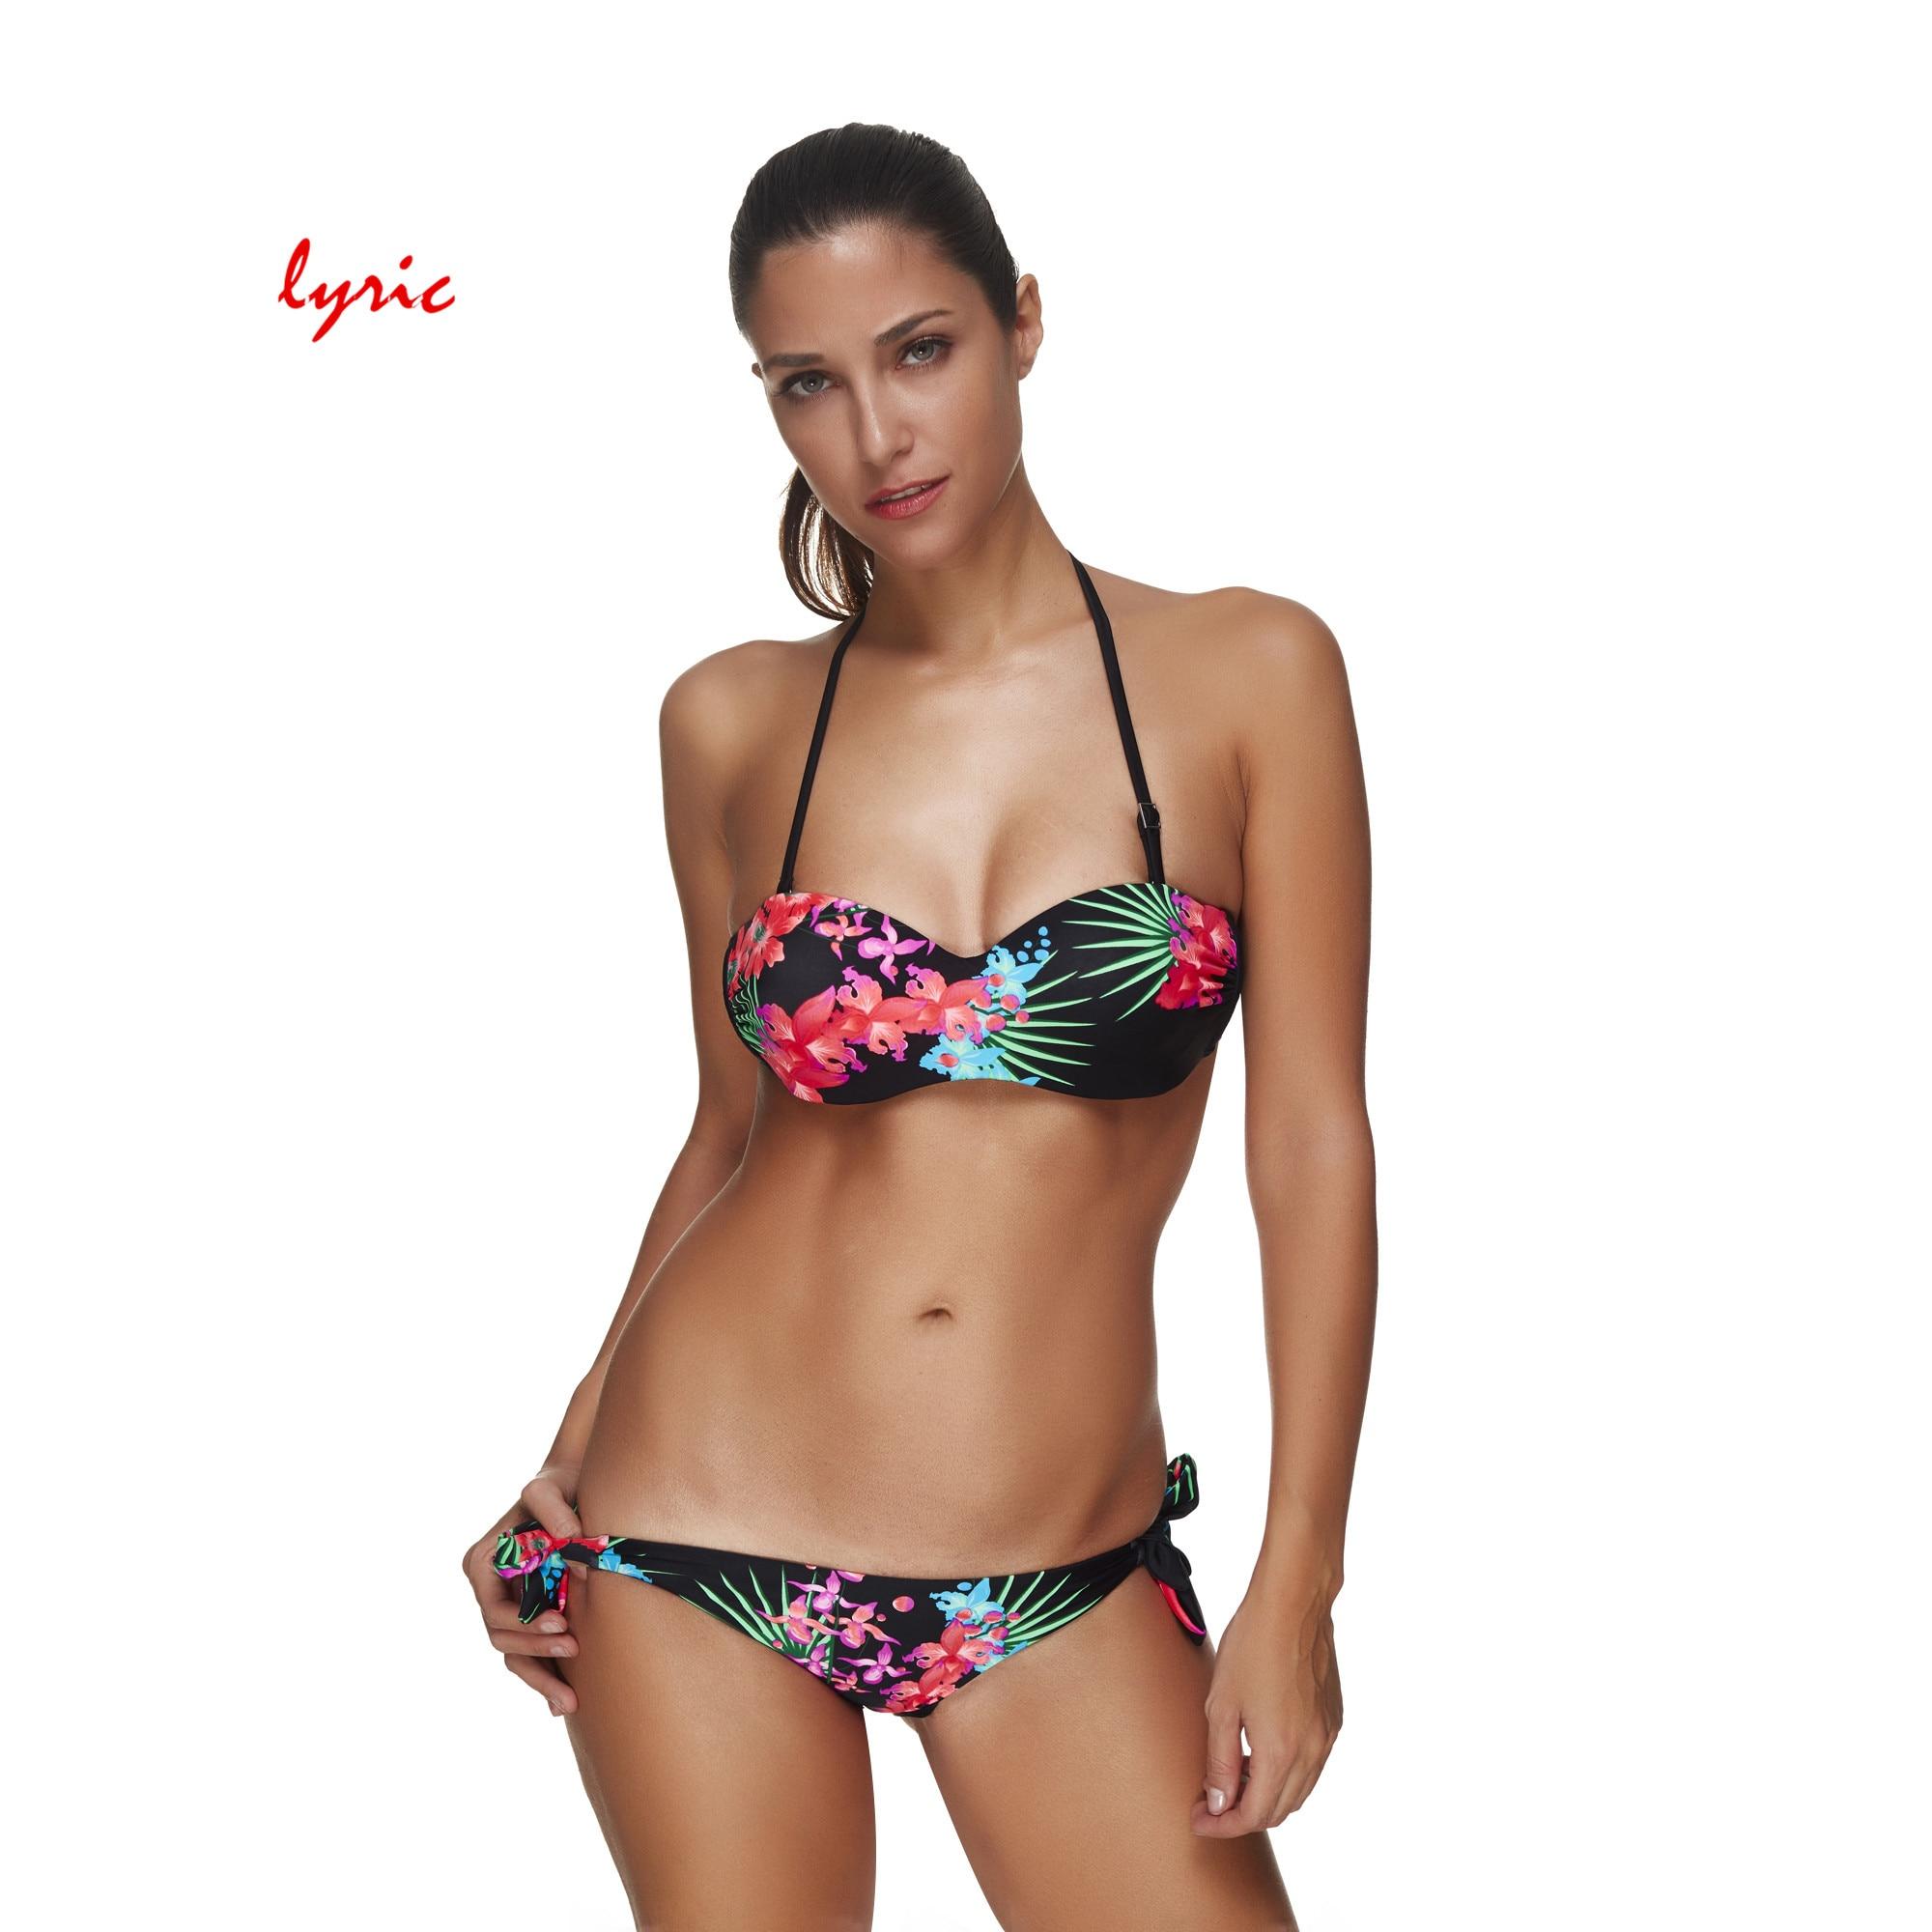 lyric Brazilian Bandeau Bikini Set Tanga Swimsuit For Women Push Up Swimwear Plus Szie Bathing Suit Swimming Costume Bather Wear kiniki kelly tanga mens